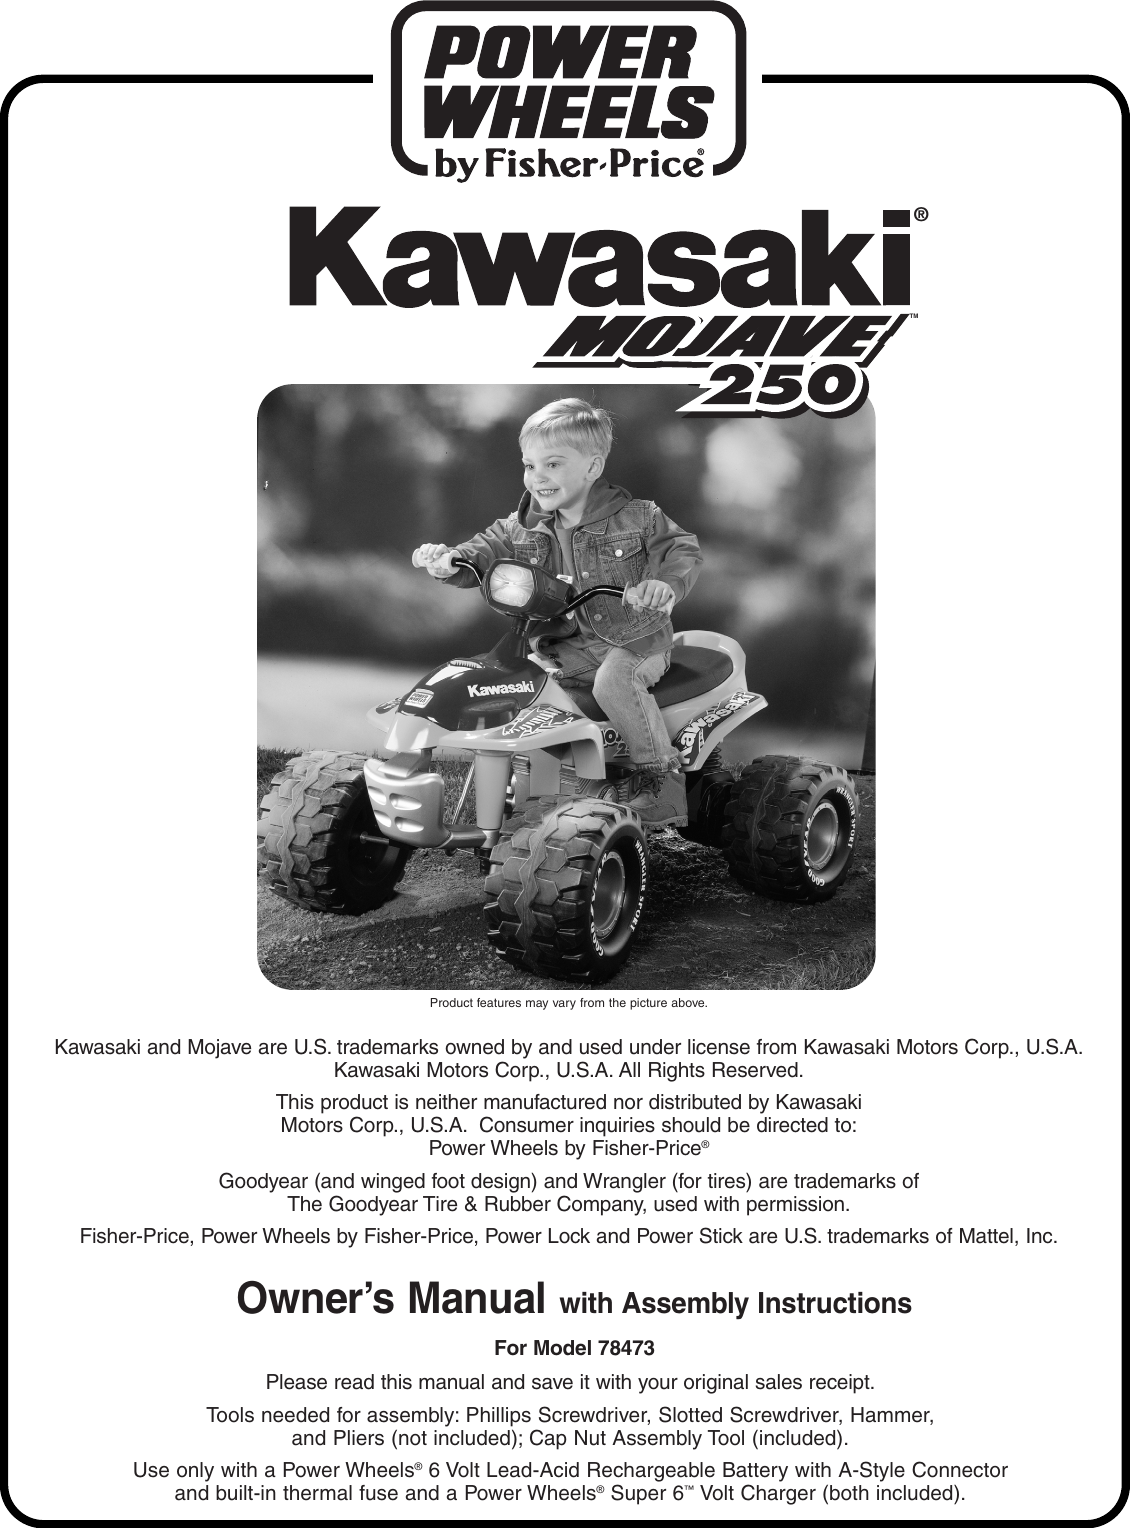 Kawasaki Mojave 78473 Users Manual 78473pr 0920qrk Handle Hand Grip Handgrip Ninja Rr R Original